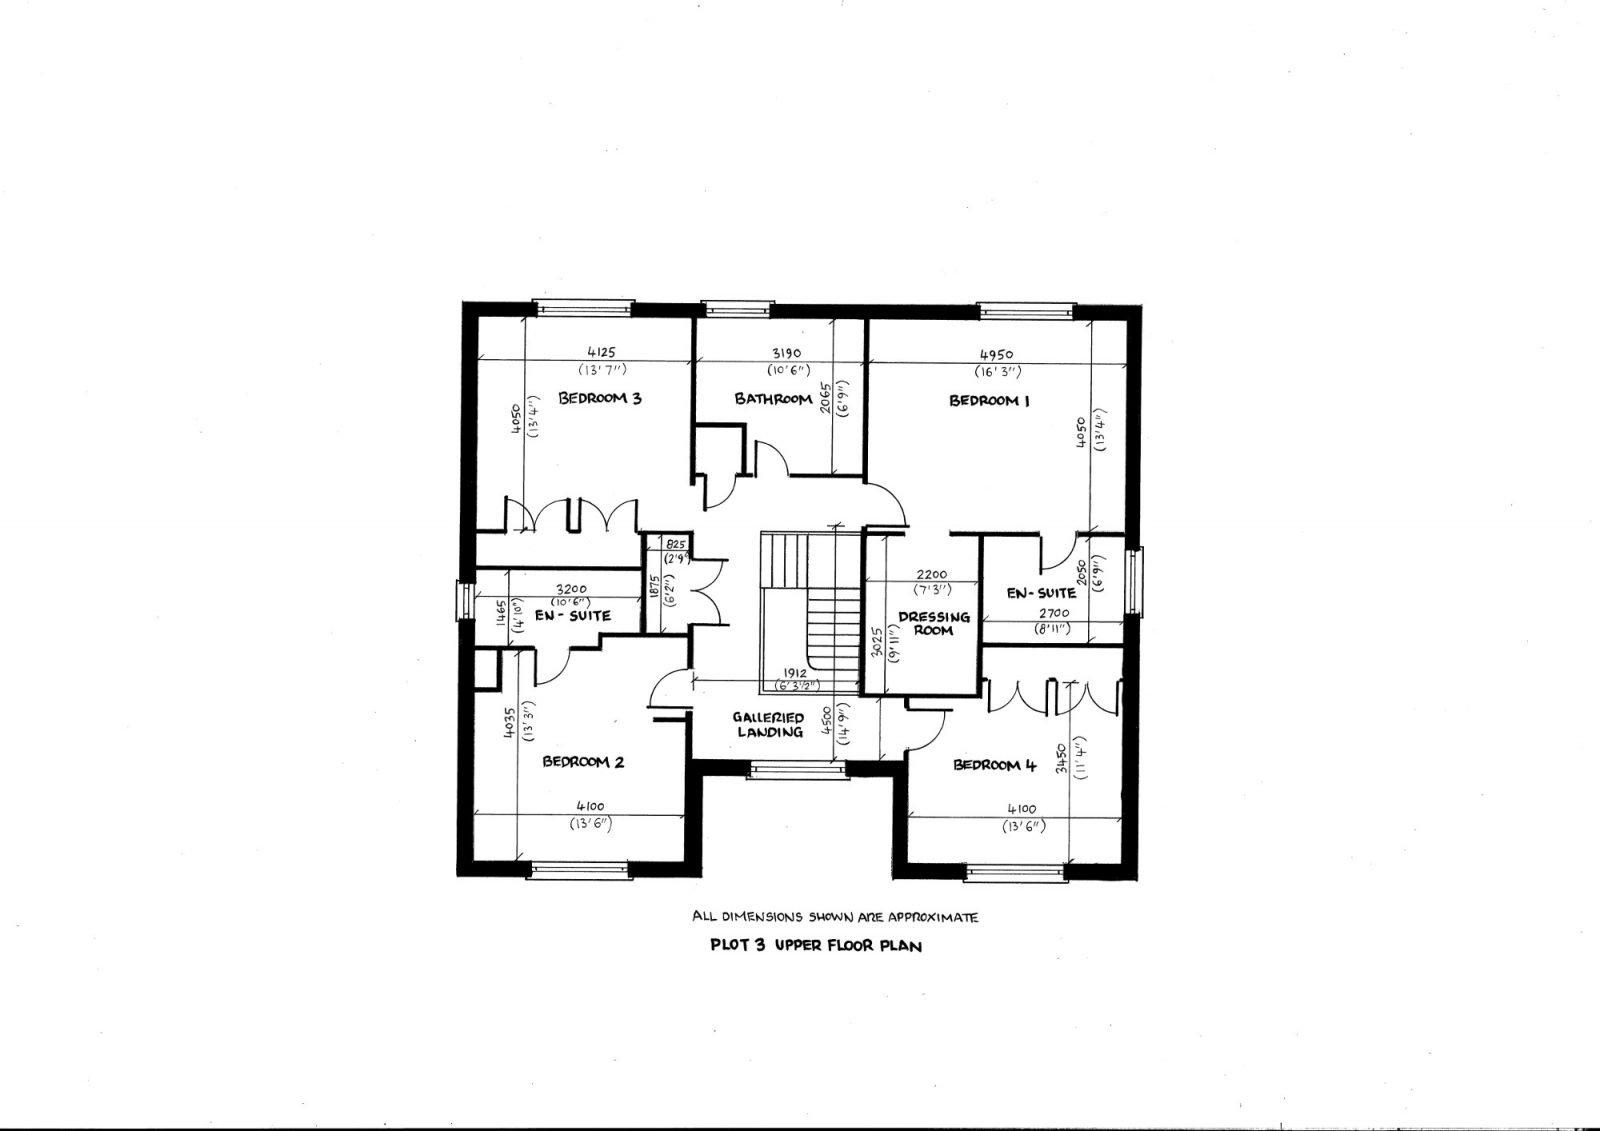 Plot 3 upper floor plan richard reed builders for Find plot plan online